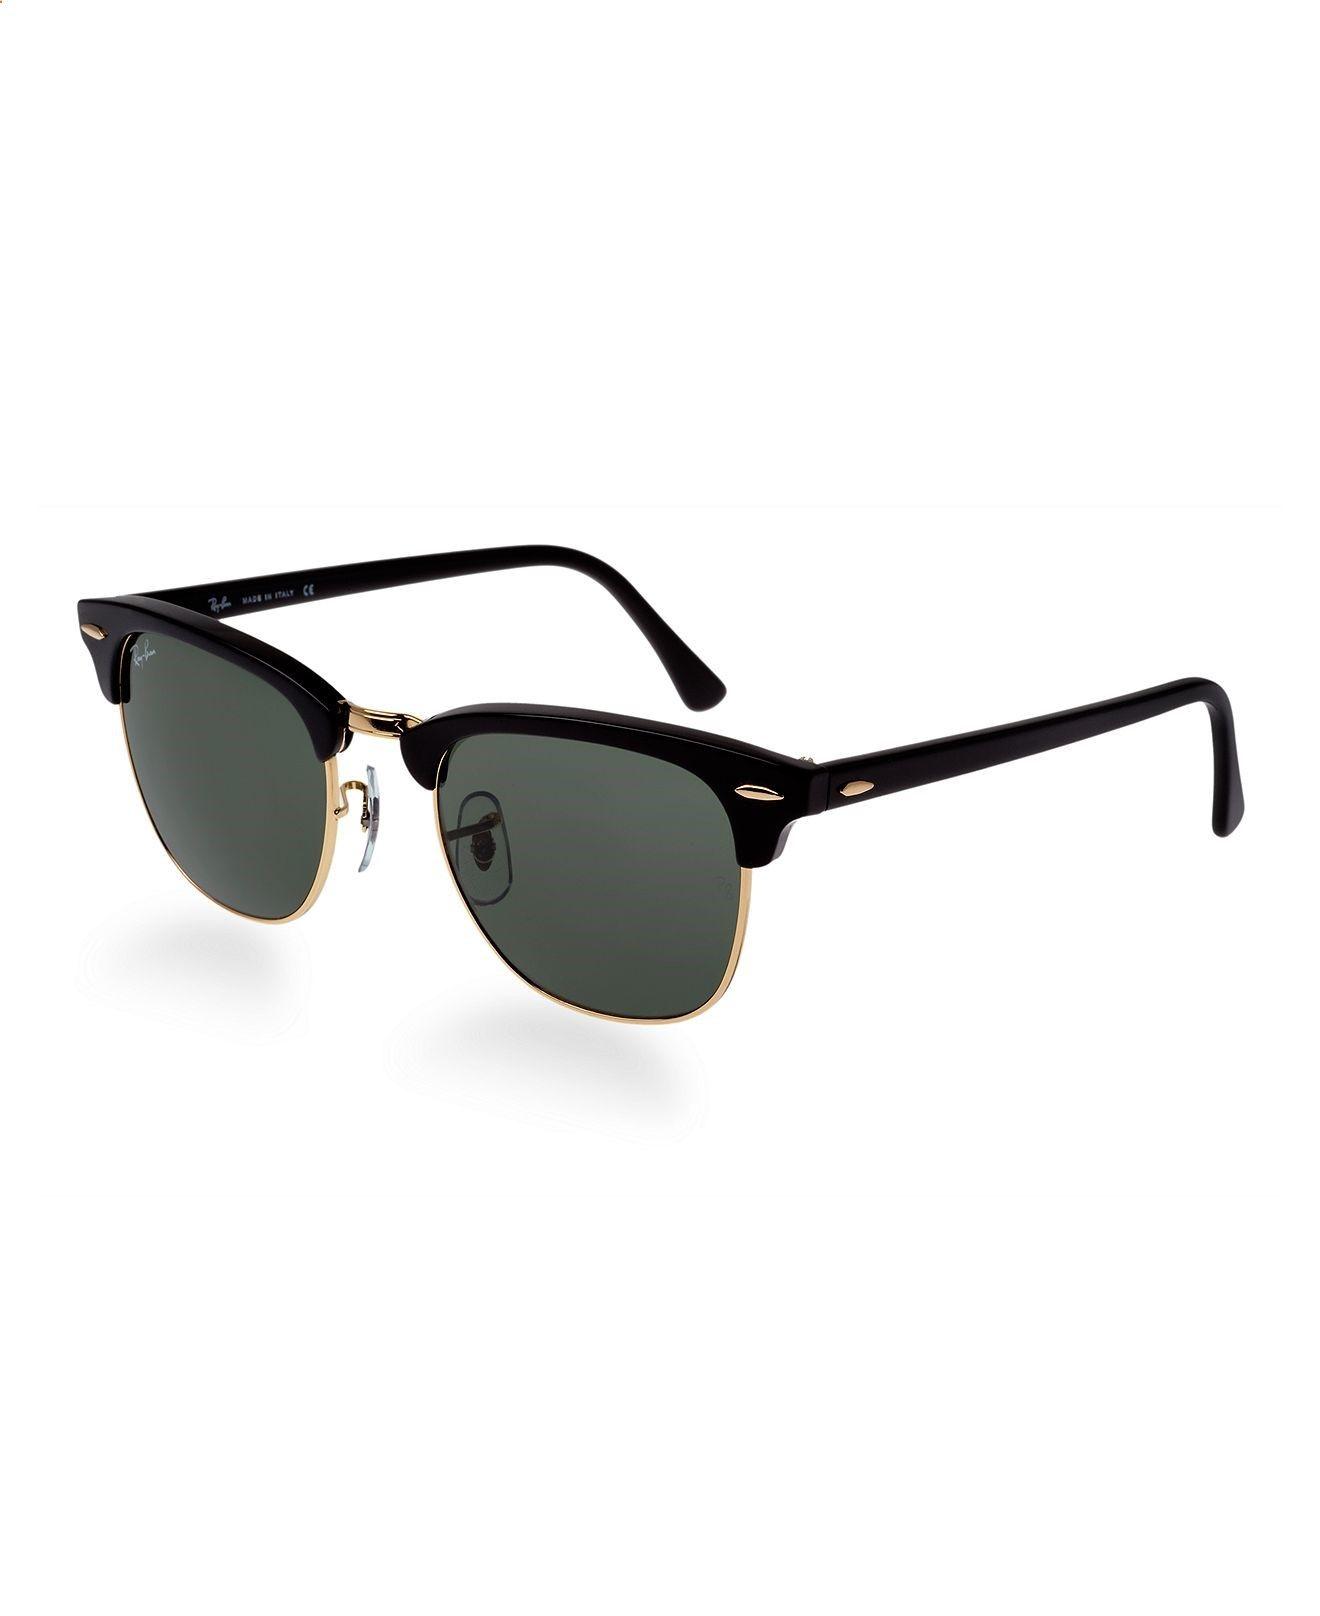 Ray-Ban Sunglasses, RB3016 49 Clubmaster - Sunglasses - Handbags  Accessories - Macys